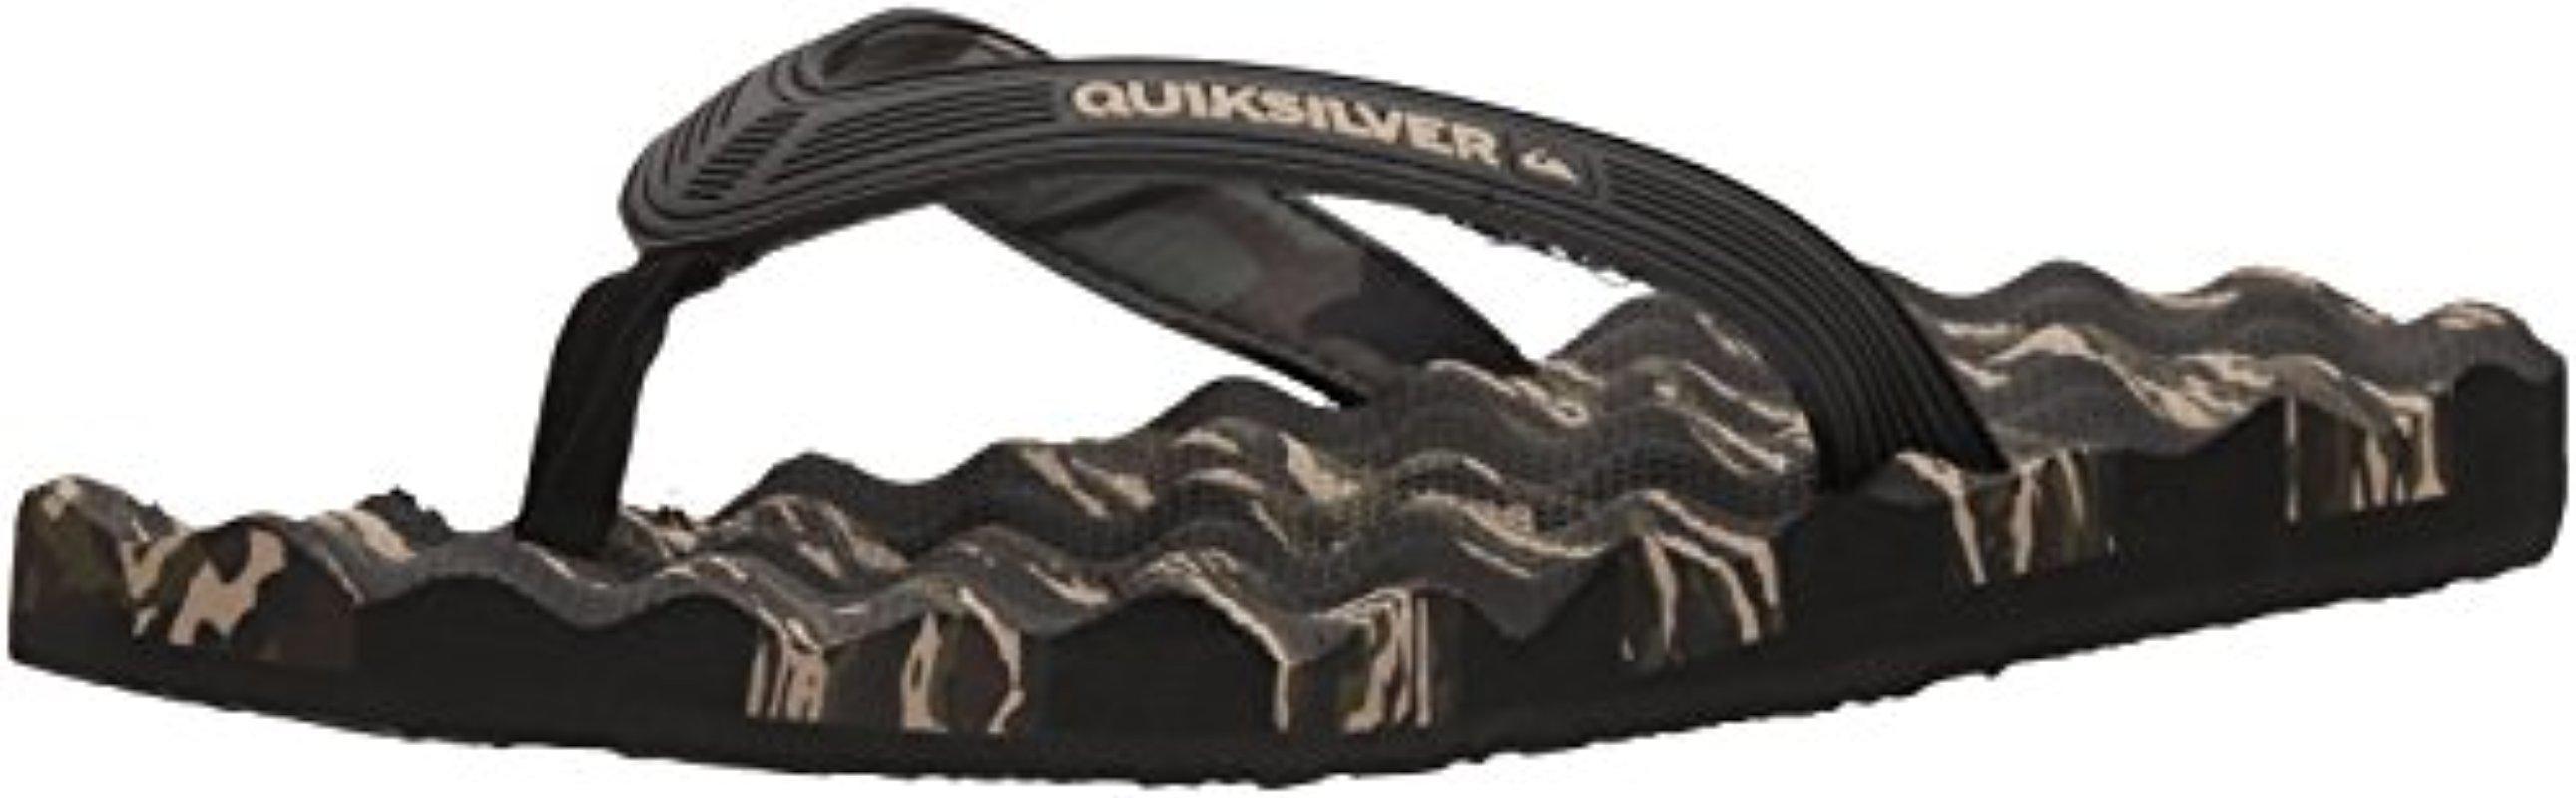 96f69a249a08 Lyst - Quiksilver Massage 3 Point Flip-flop Sandal in Black